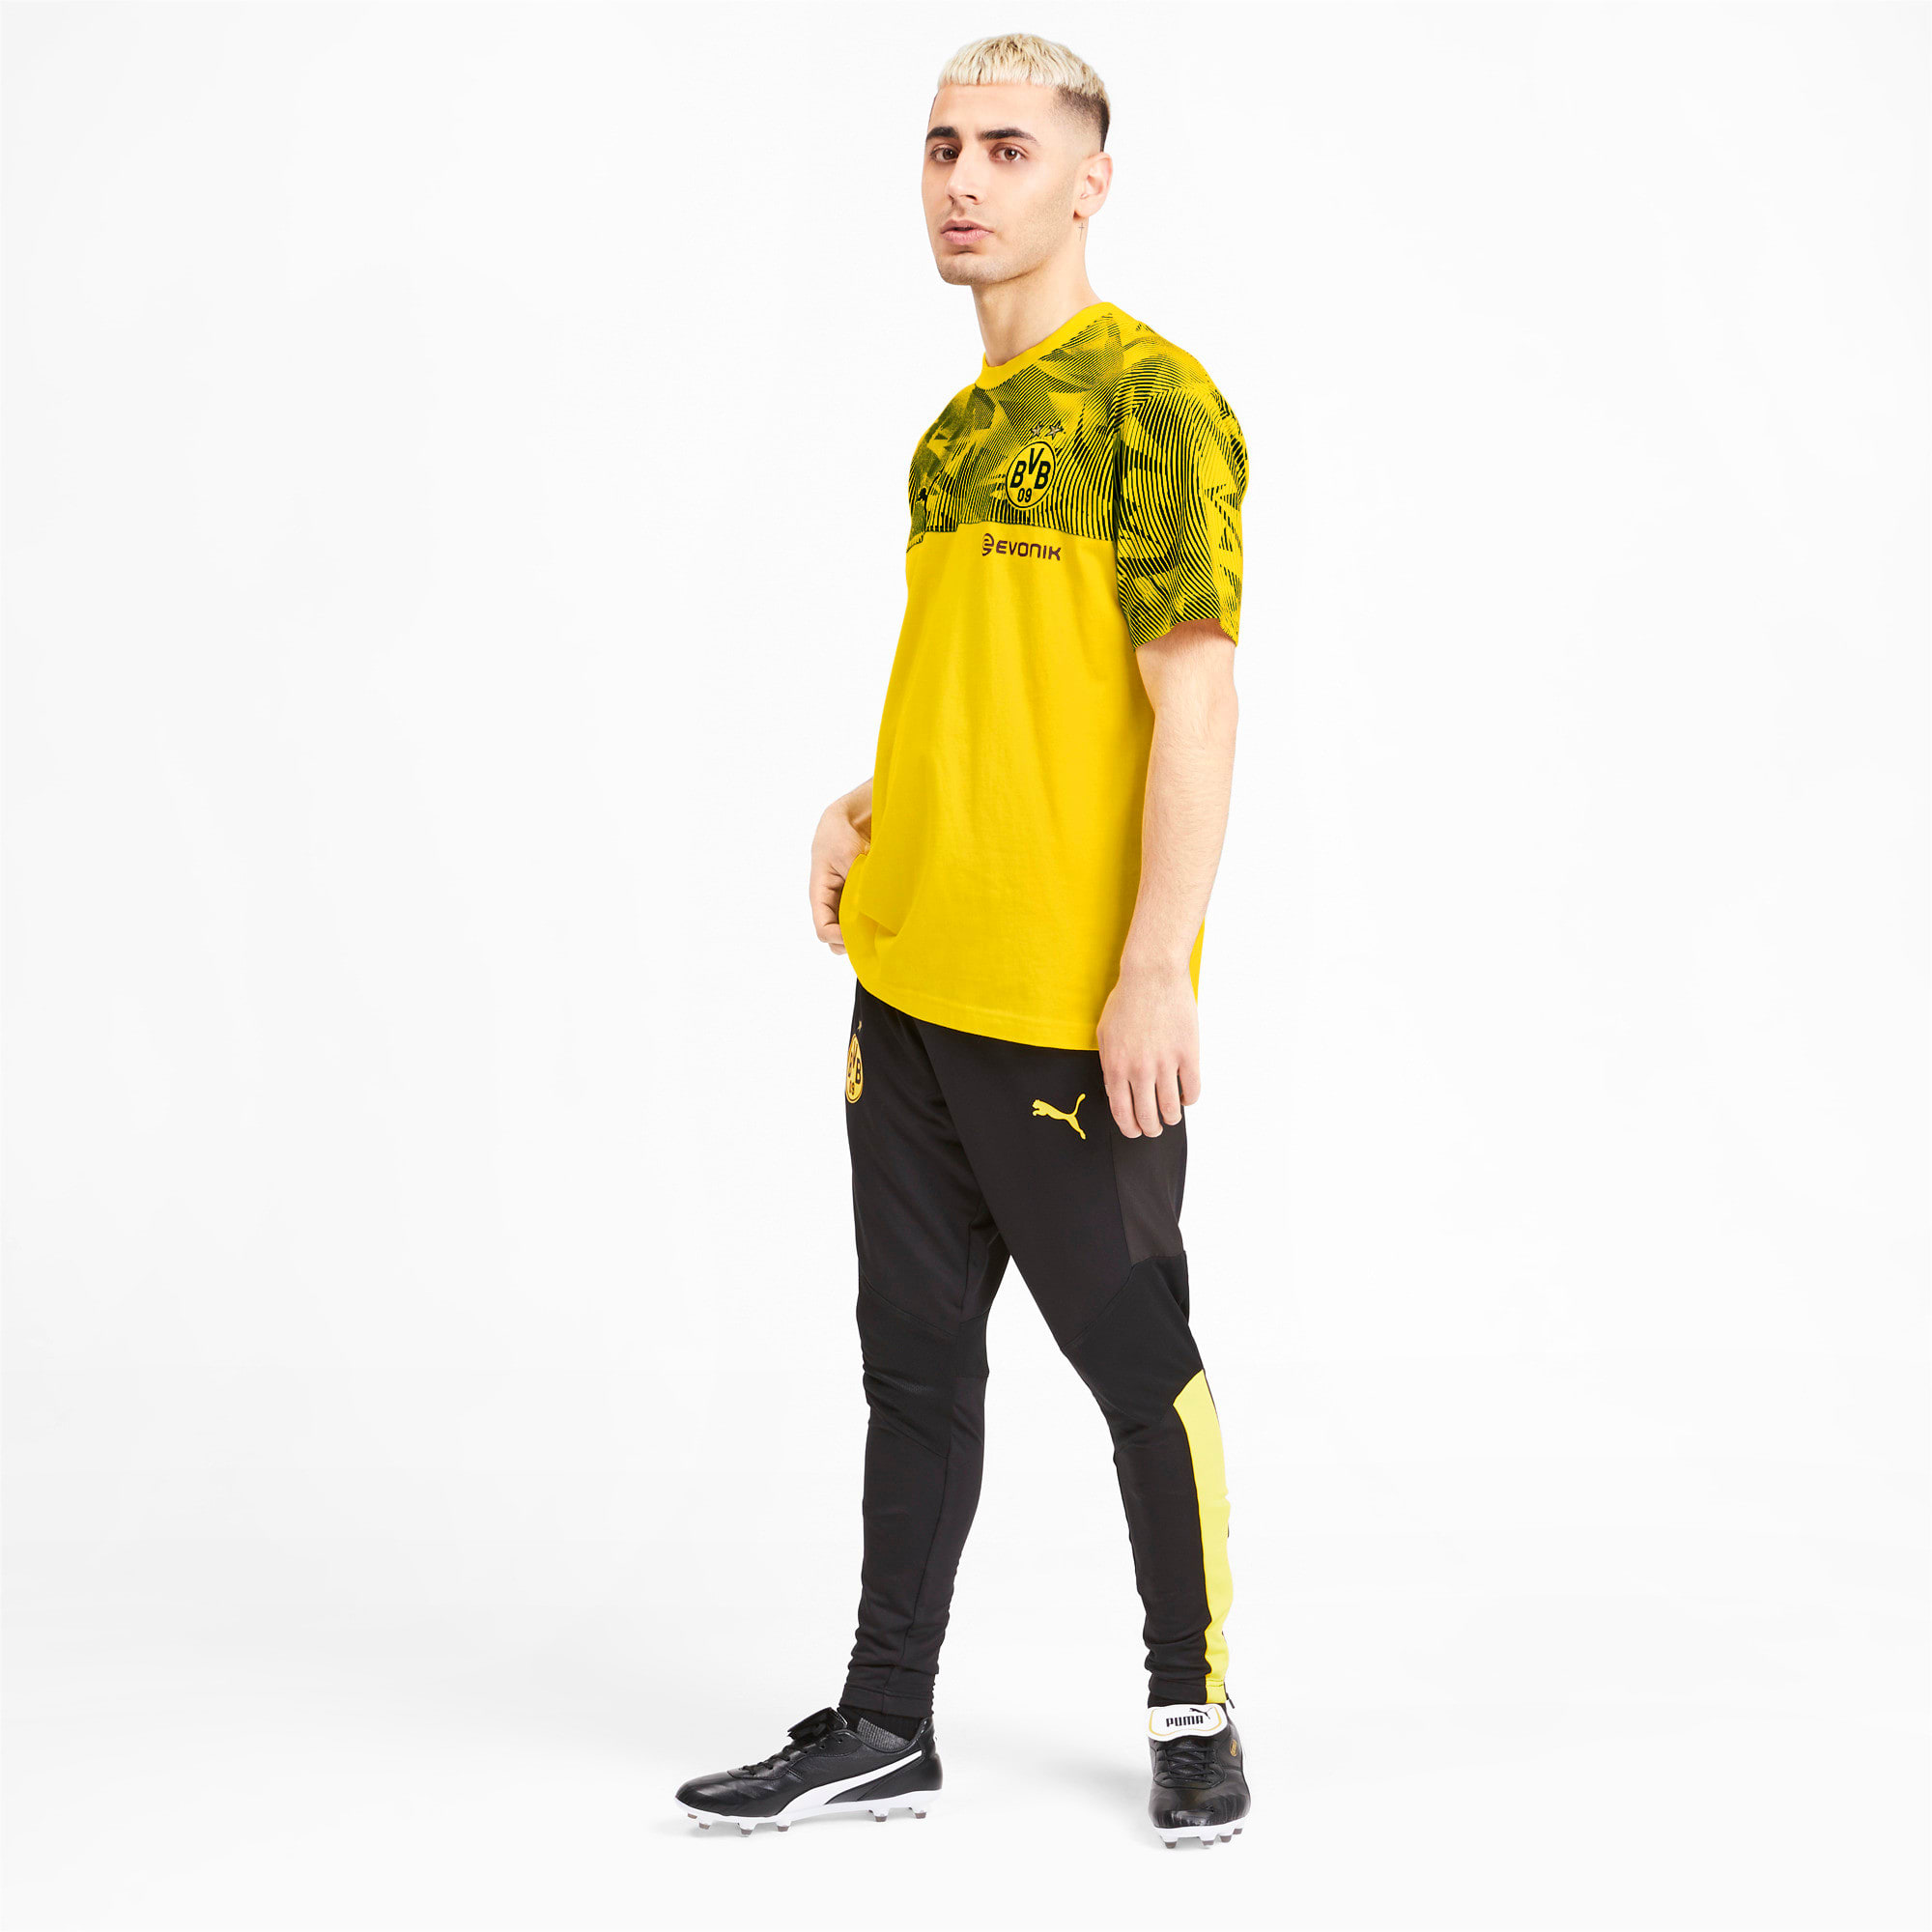 Thumbnail 3 of BVB Casuals Men's Tee, Cyber Yellow-Puma Black, medium